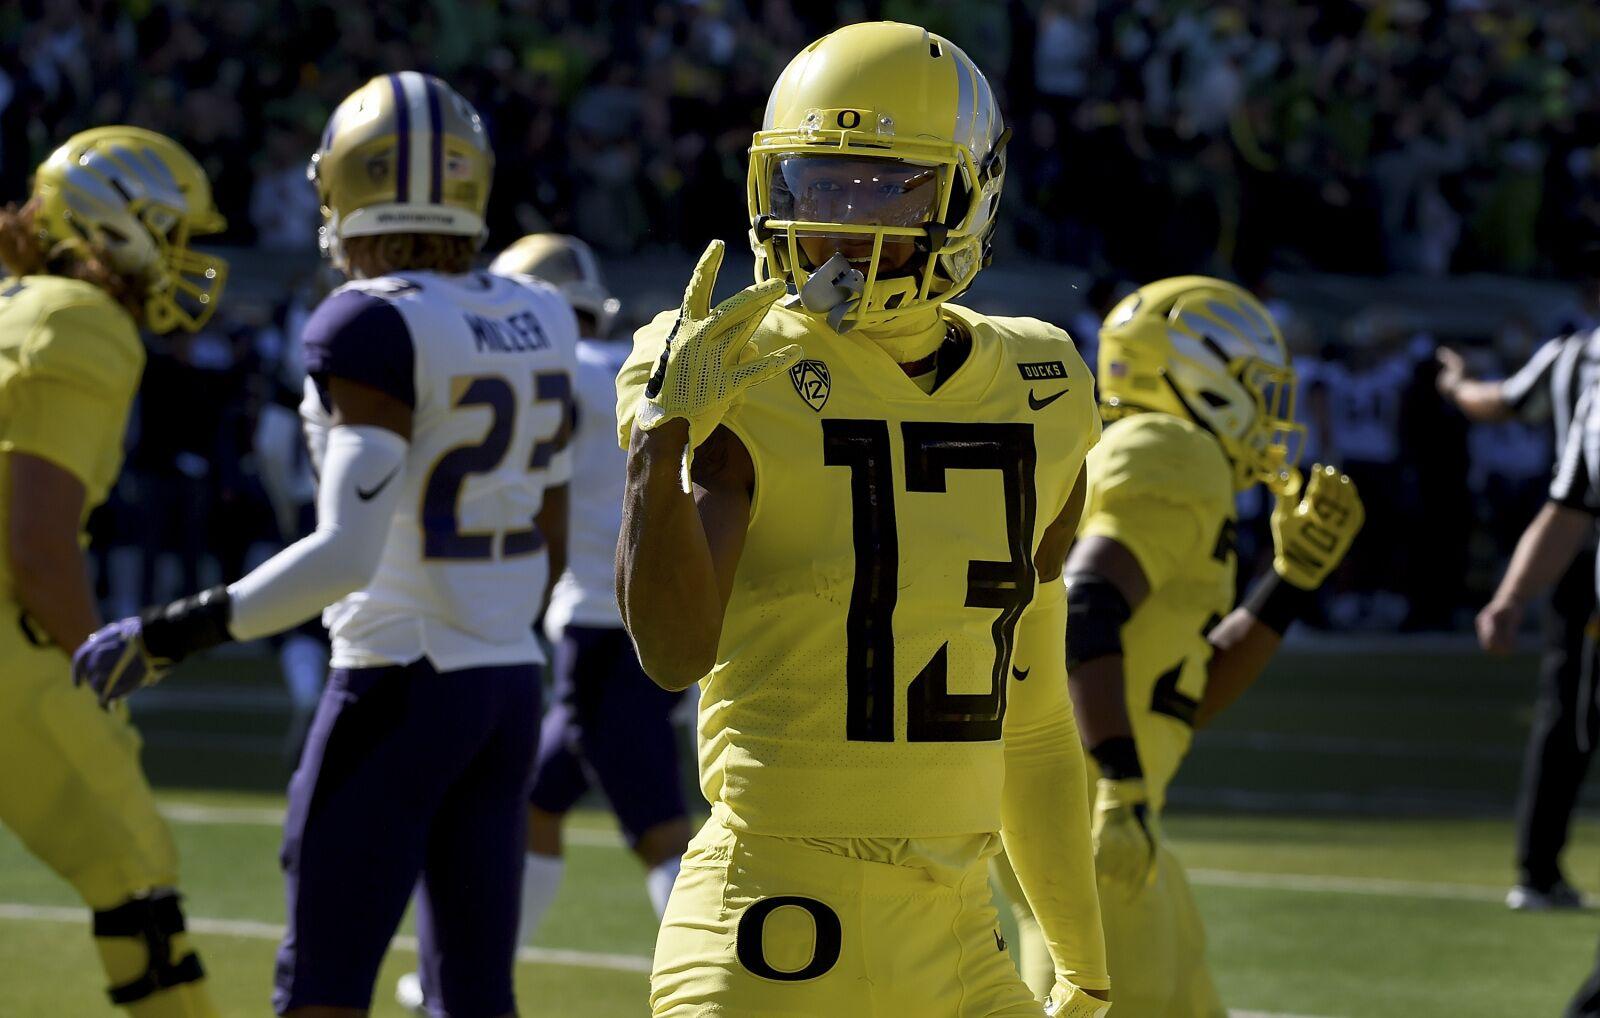 Oregon Football: Ducks Bring Revitalized Offense to Seattle